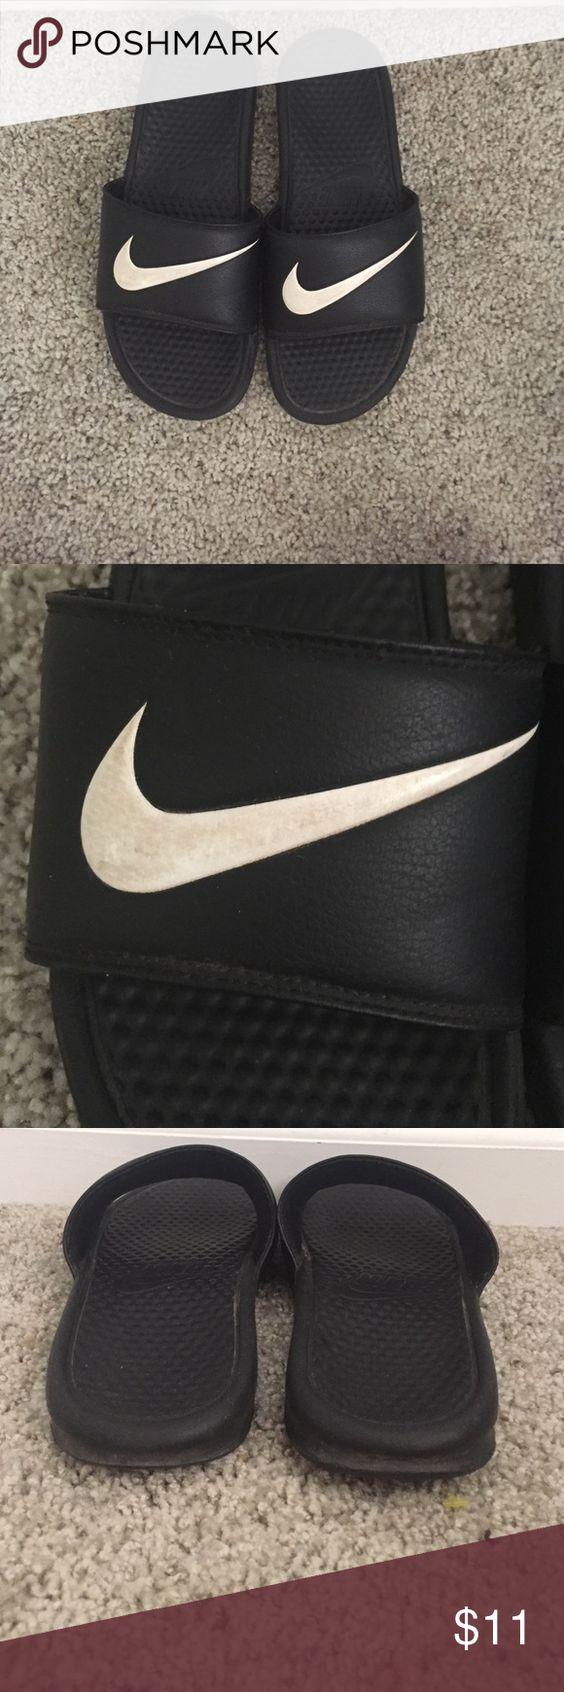 Nike slides men's size 9 Black nike slides with a white swoosh. The white  swoosh